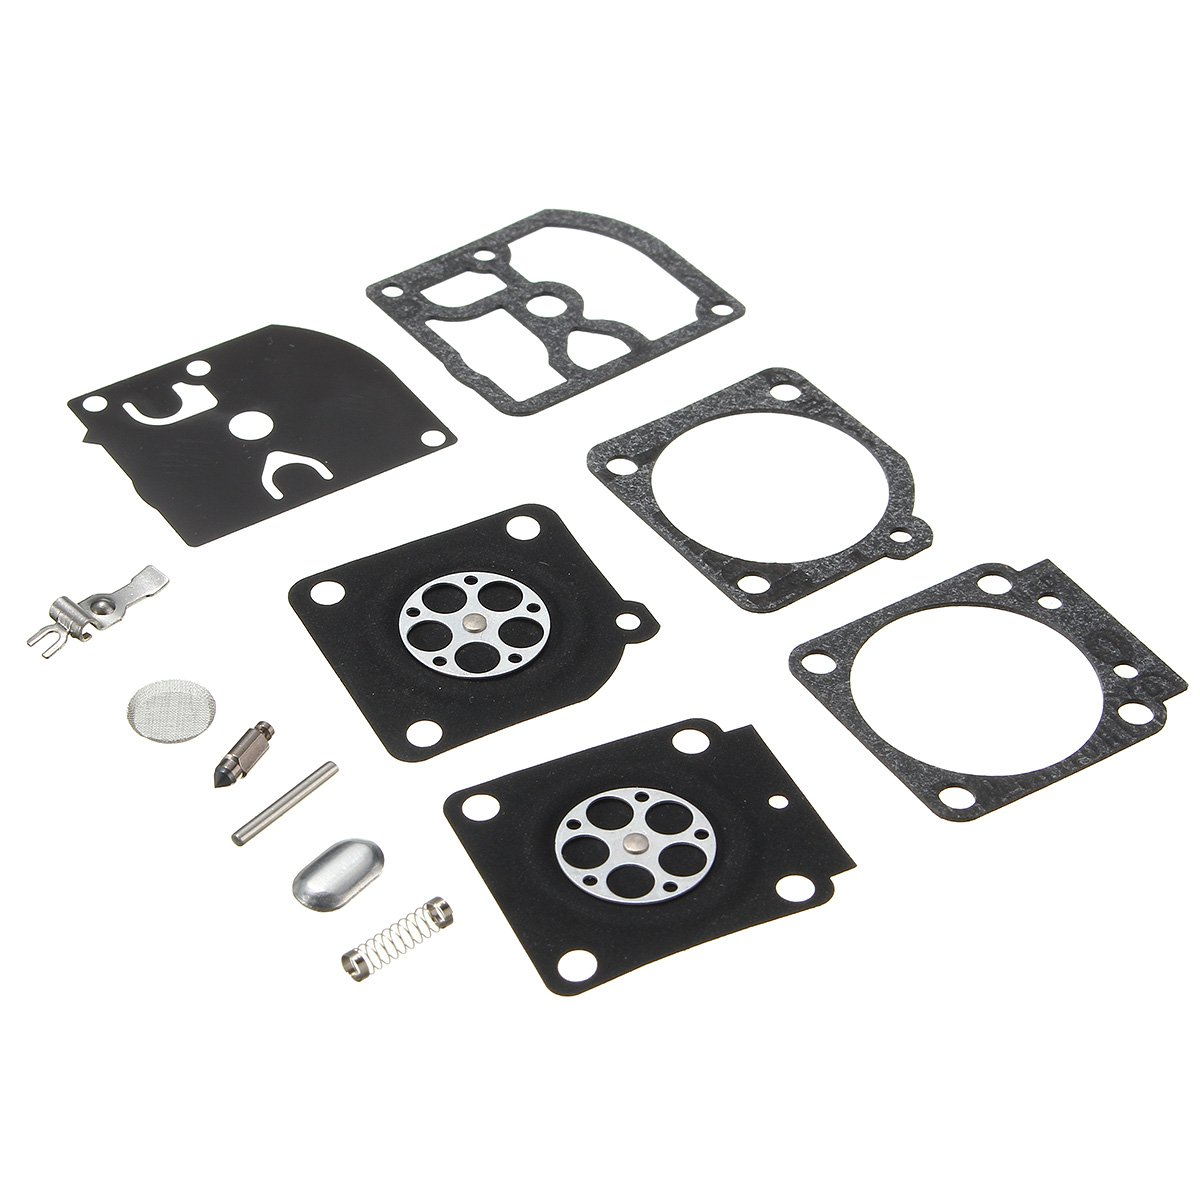 RISHIL WORLD/® Carburetor Gaskets Kit for STIHL 1129 1137 020T MS192 MS200 MS200T ZAMA RB-69